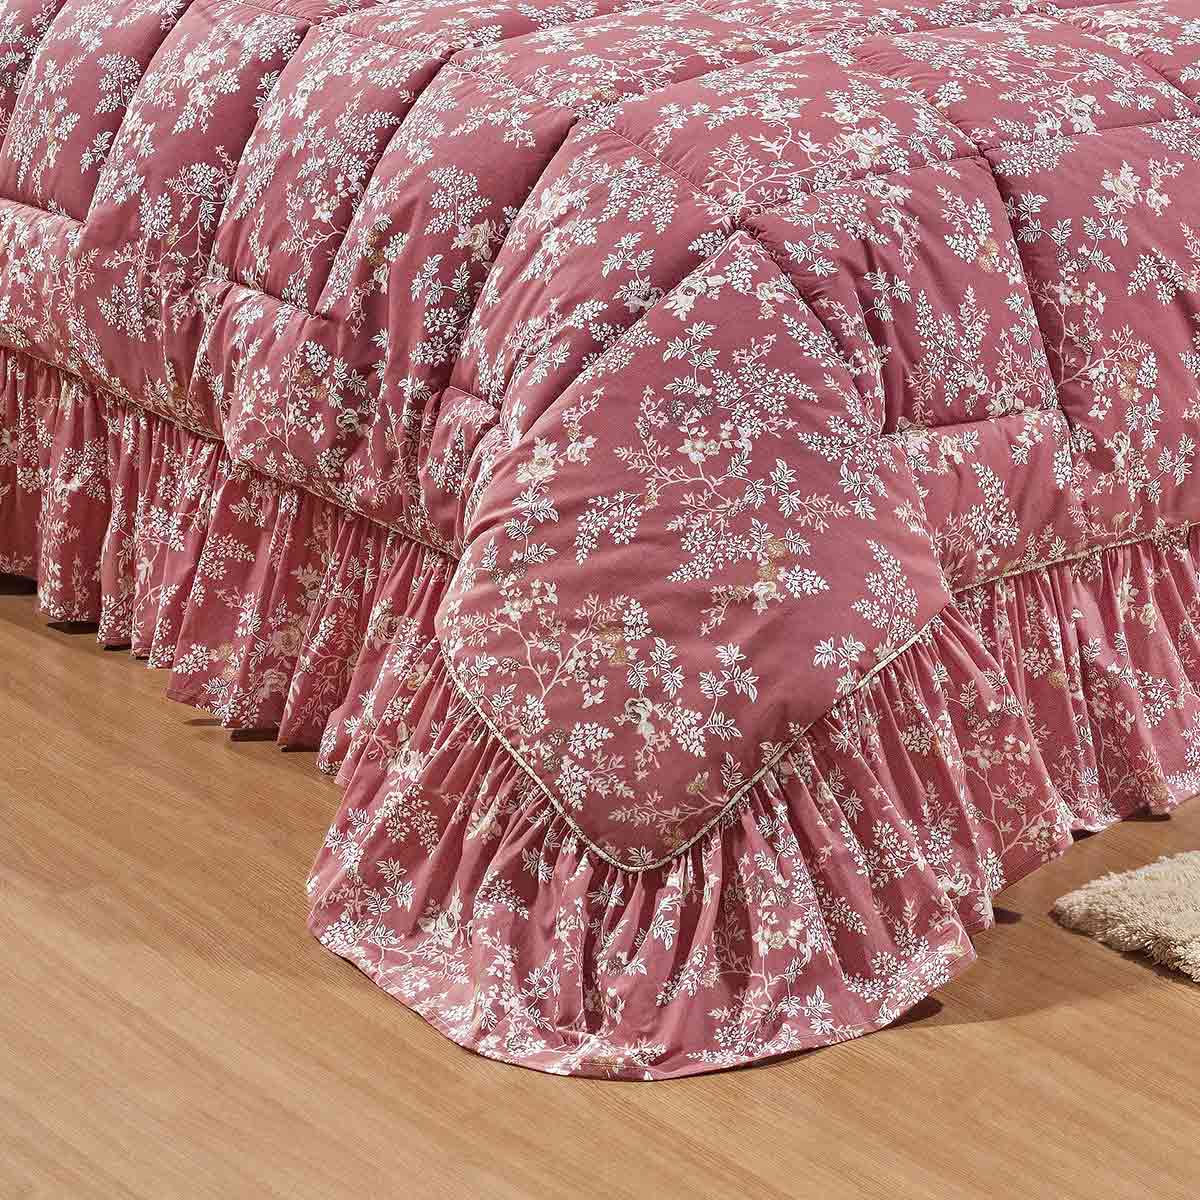 Colcha Casal Queen Kit Bouquet Percal 200 Fios Florida com 20 peças